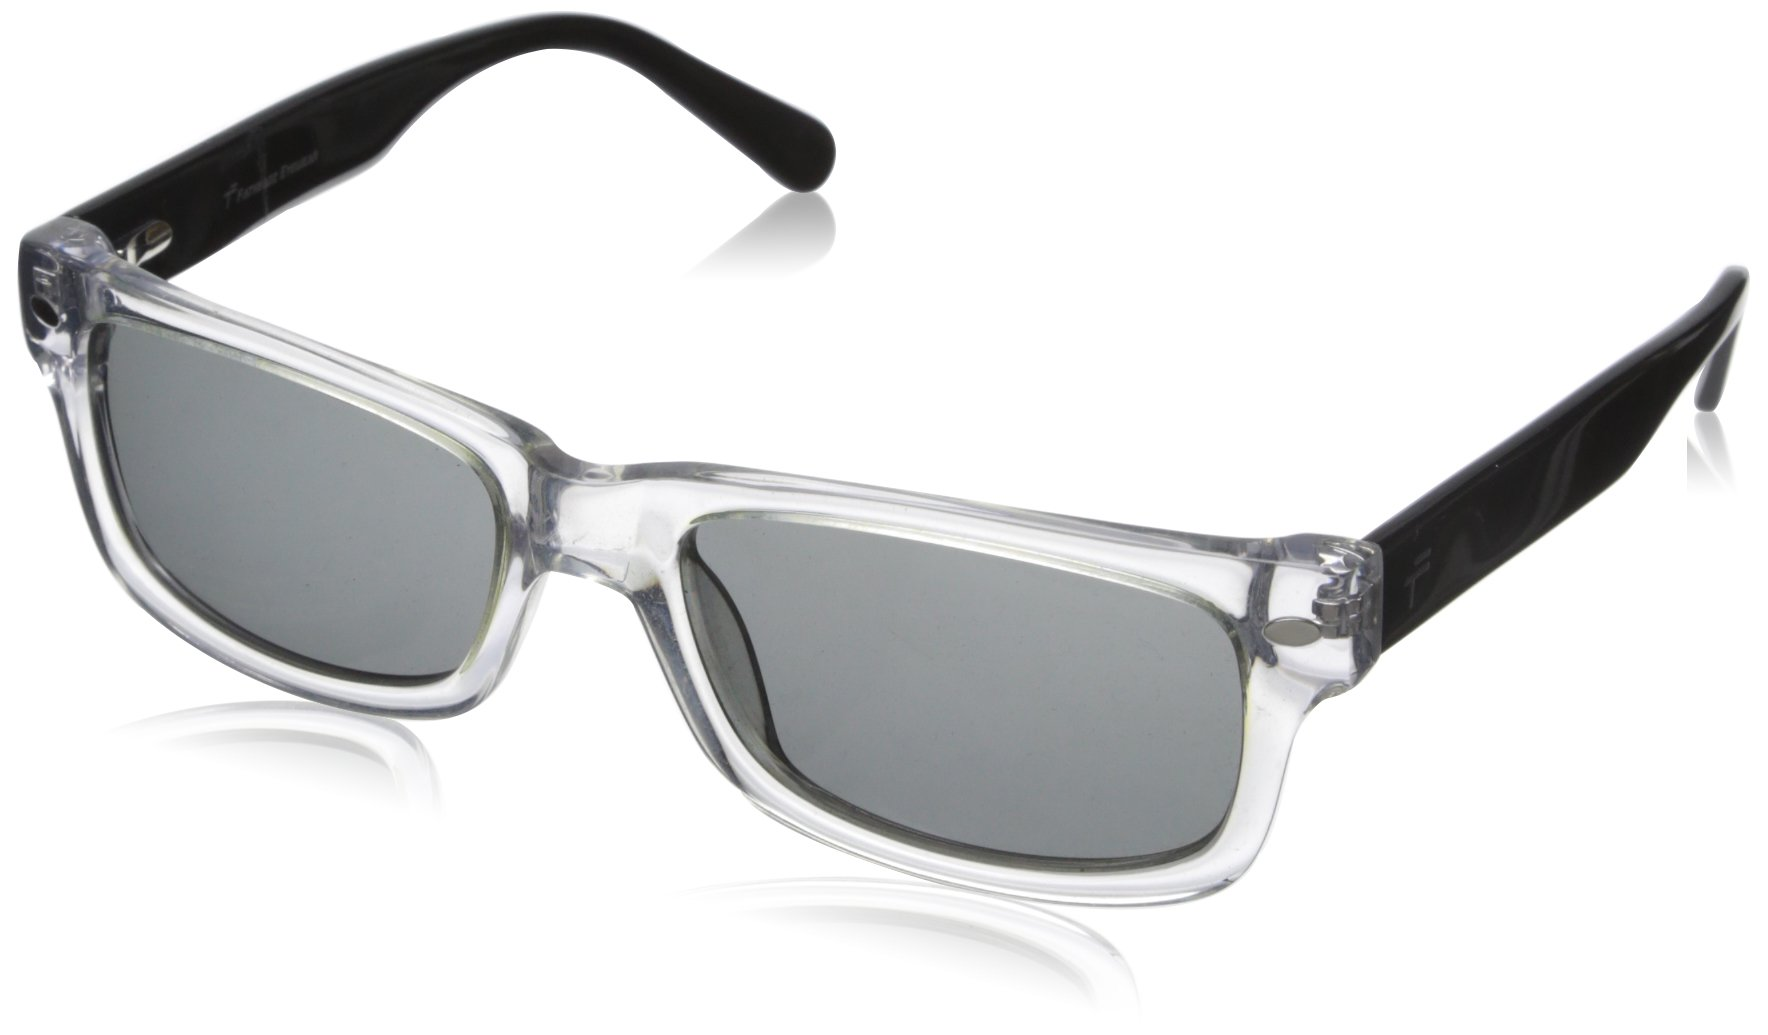 Fatheadz Eyewear Men's Matty Polarized Rectangular Sunglasses